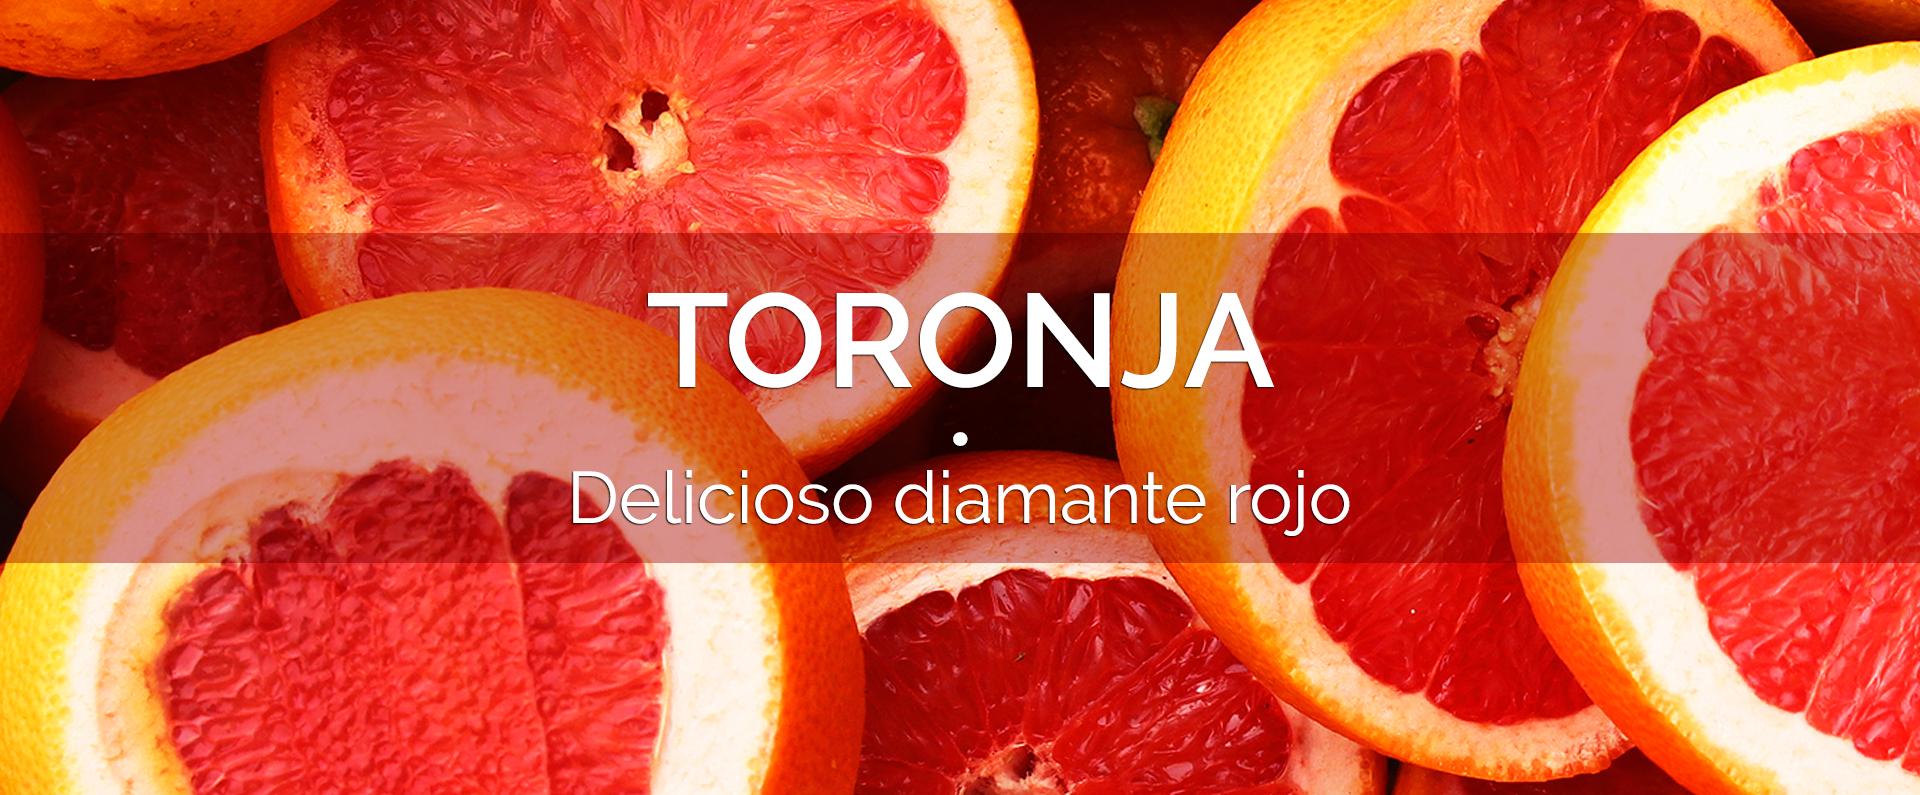 banner_toronja_espanol